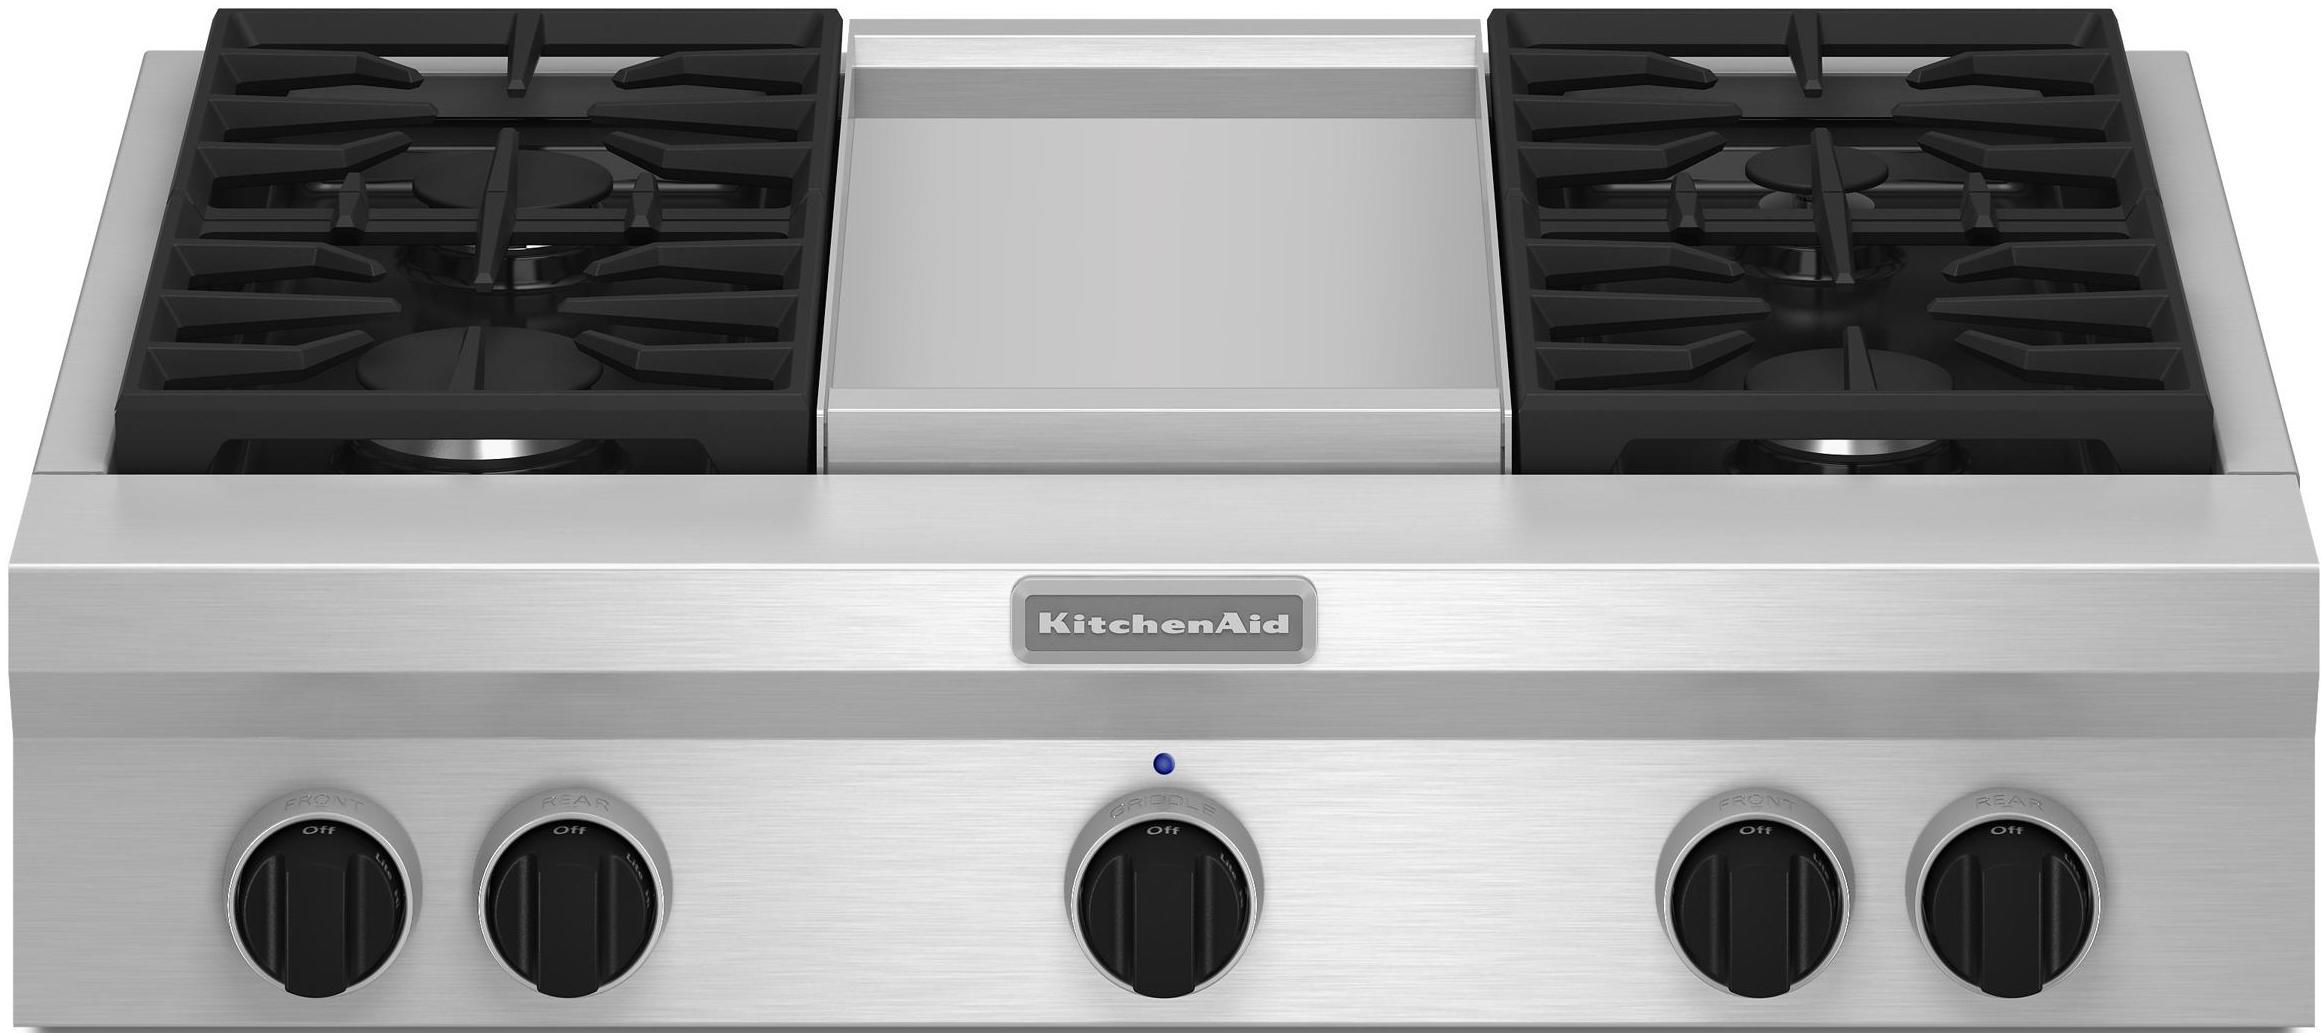 "KitchenAid Gas Cooktops 36"" Built-In Gas Cooktop - Item Number: KGCU463VSS"